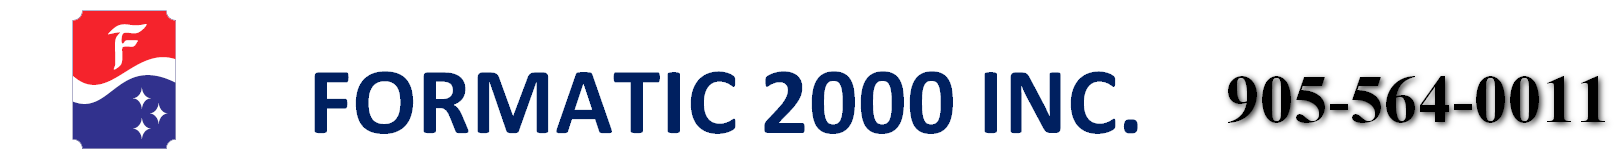 FORMATIC 2000 INC